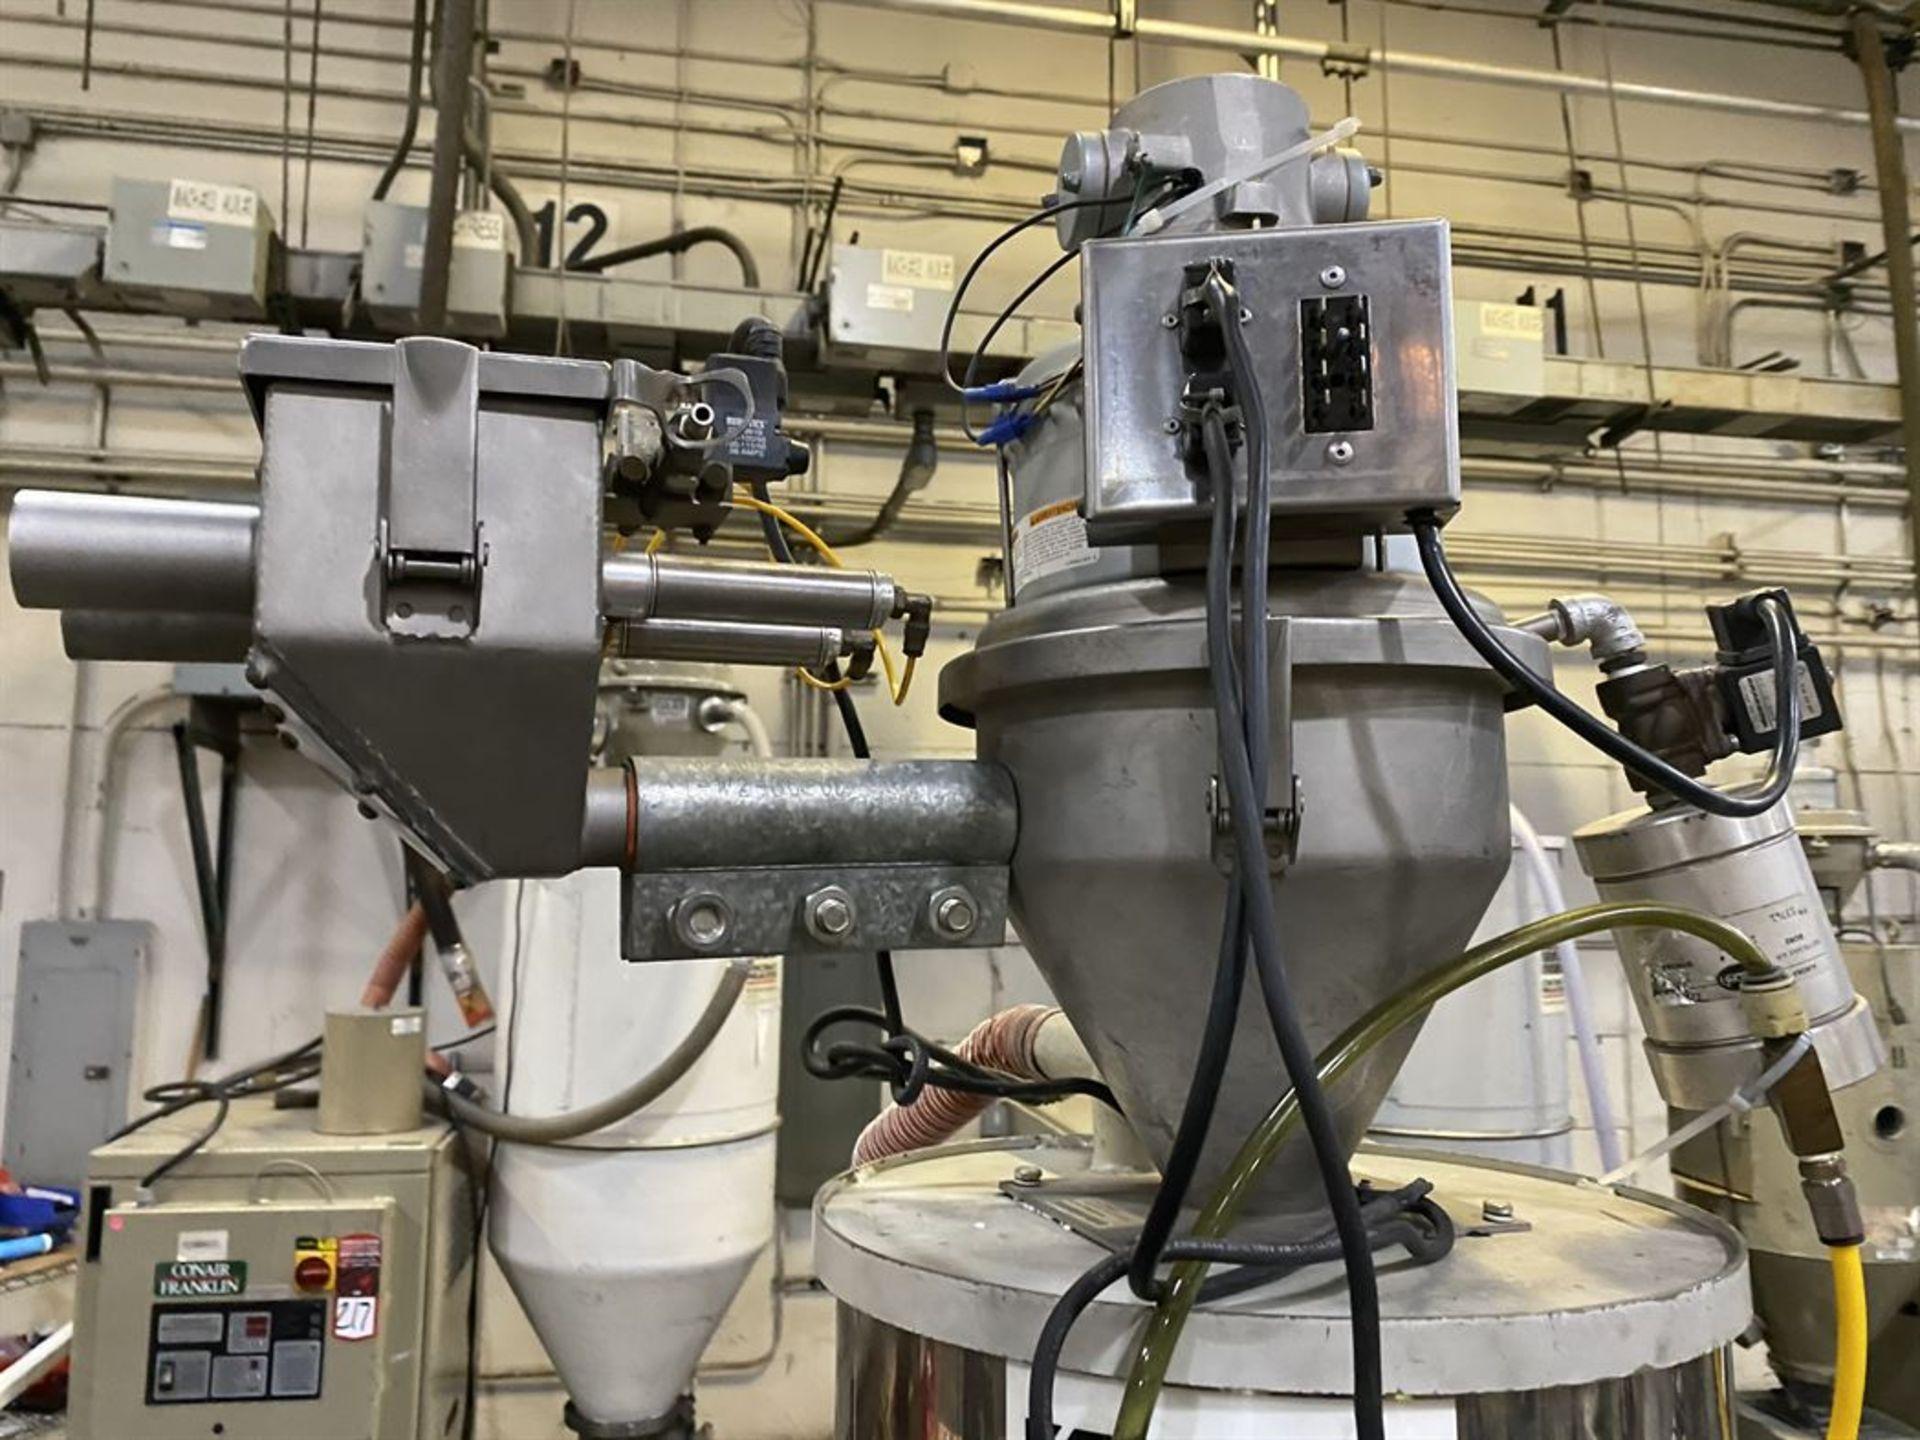 Lot 219 - Cincinnati Milacron M-GS-60 Hopper Dryer System, s/n 3933A01-05-42, w/ Vacuum Loader